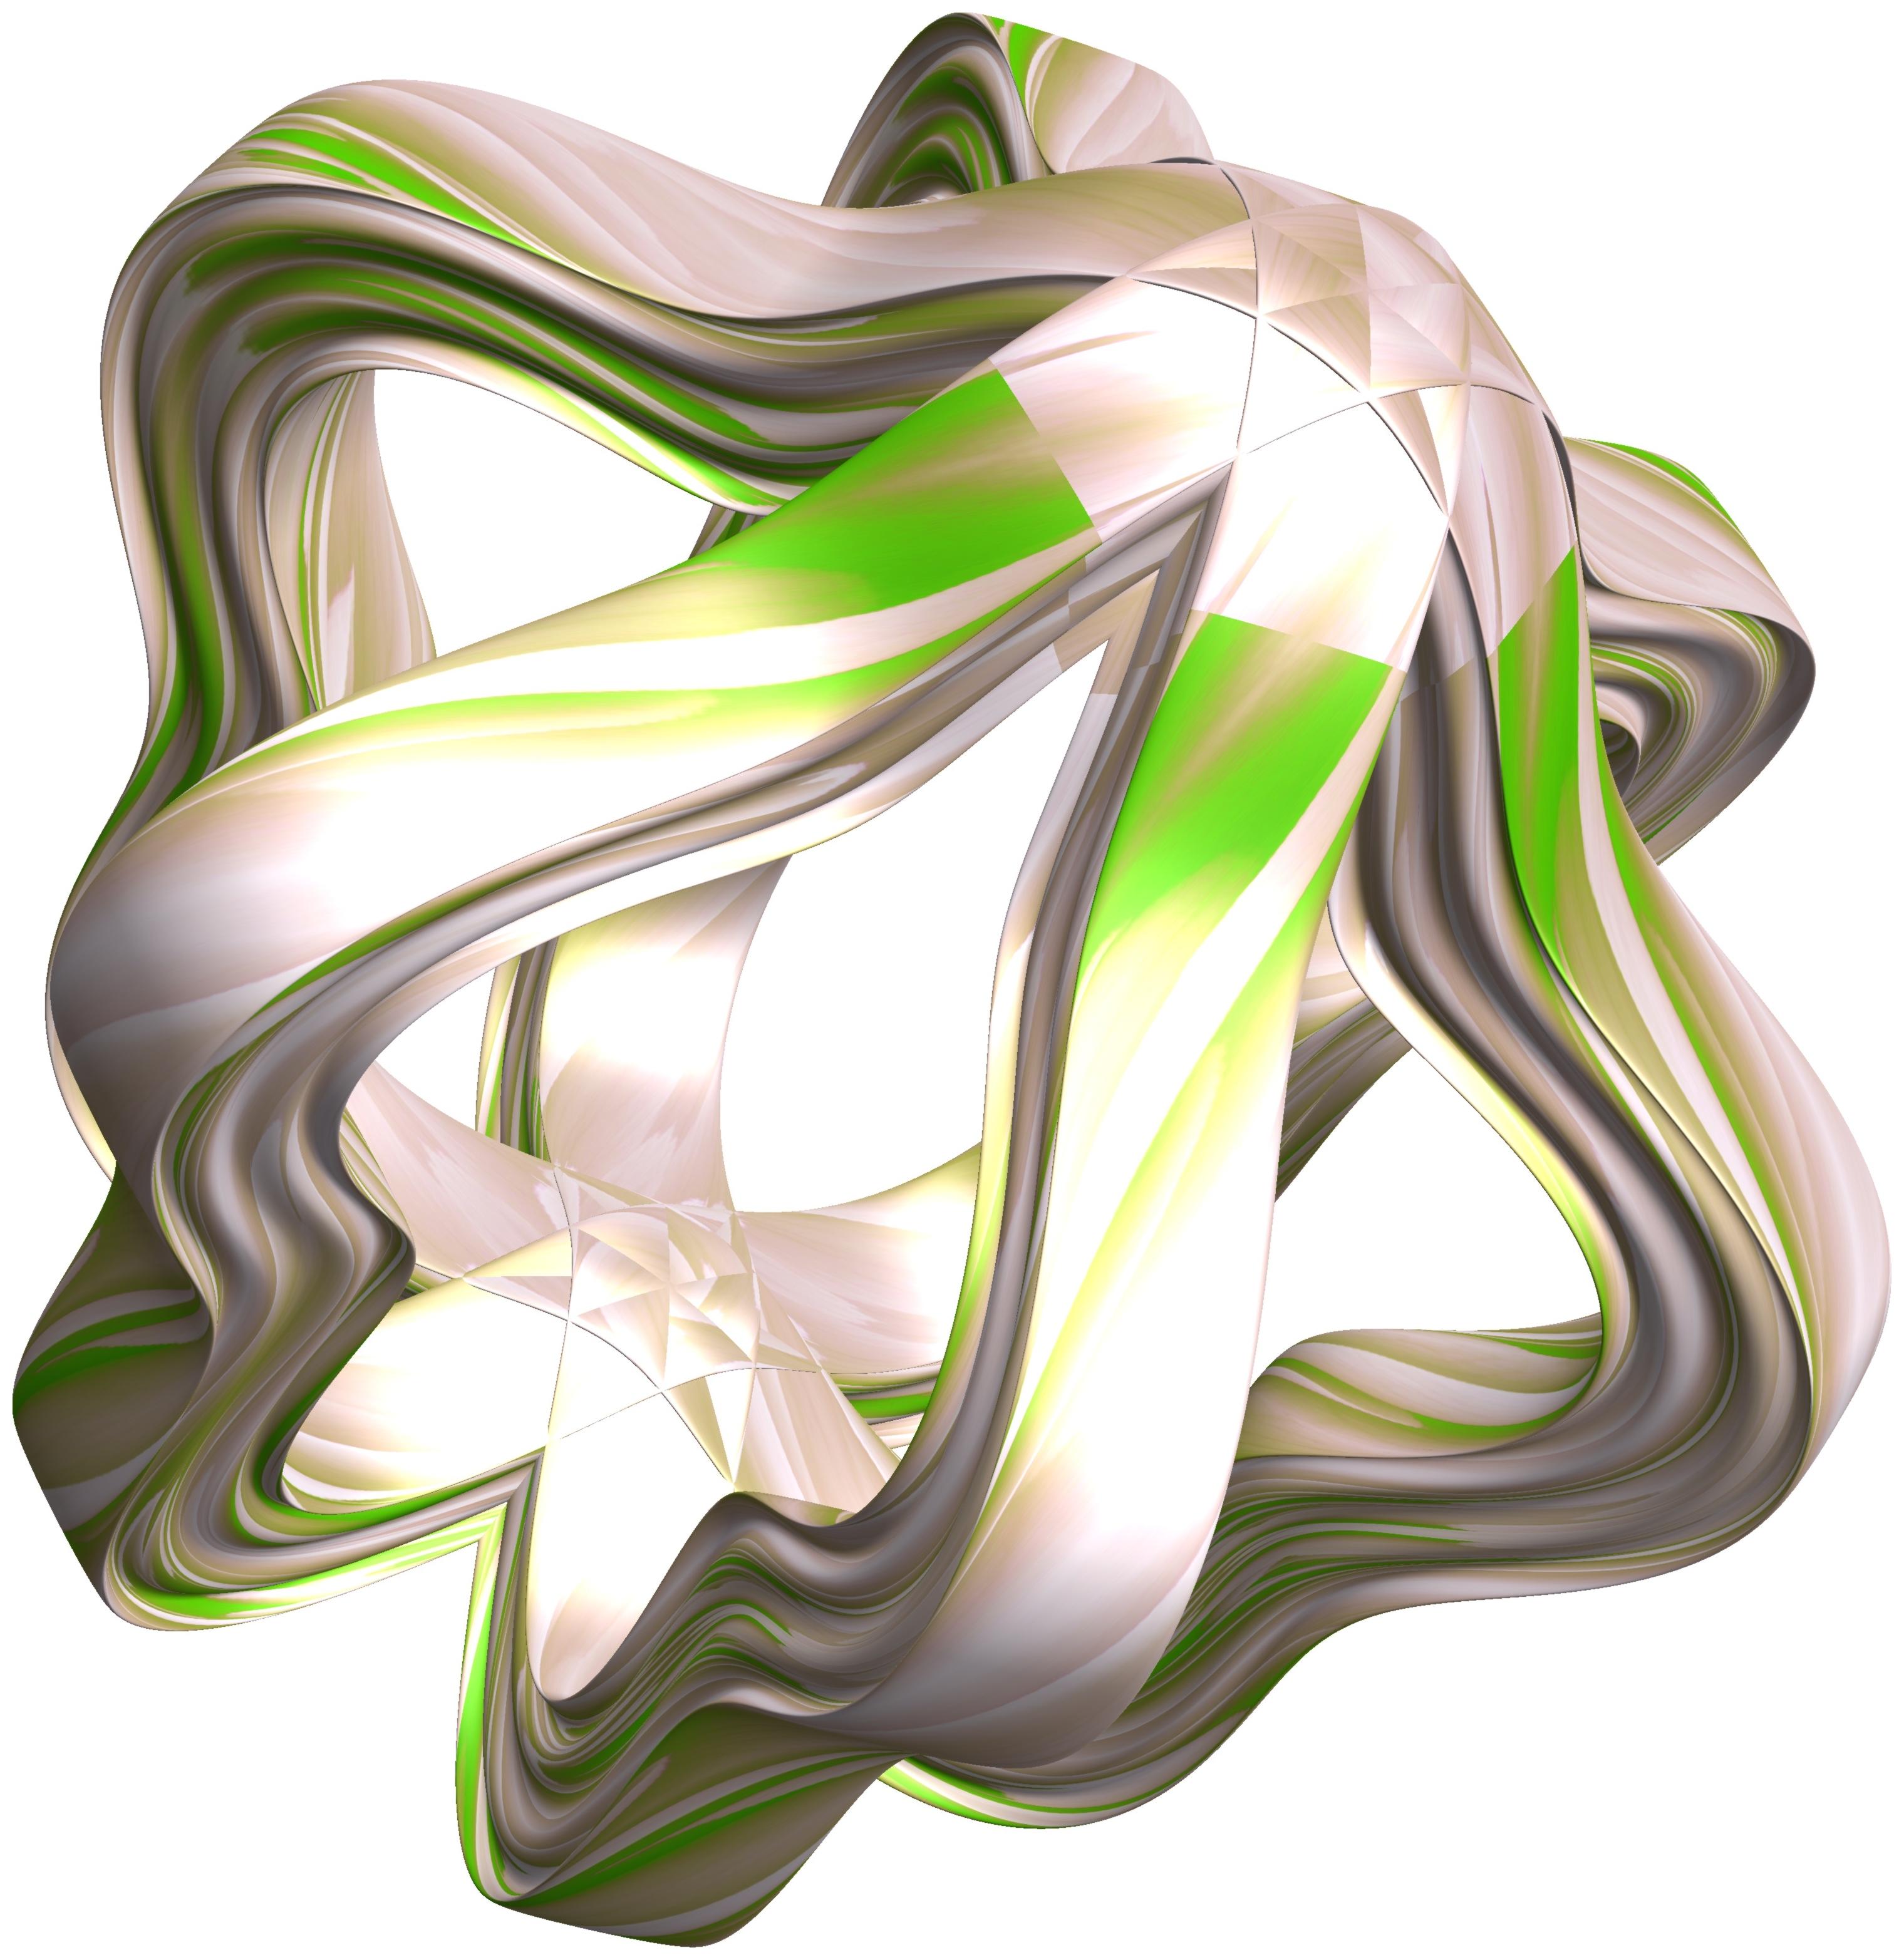 Gambar Struktur Tekstur Pola Geometri Katak Reptil Amfibi